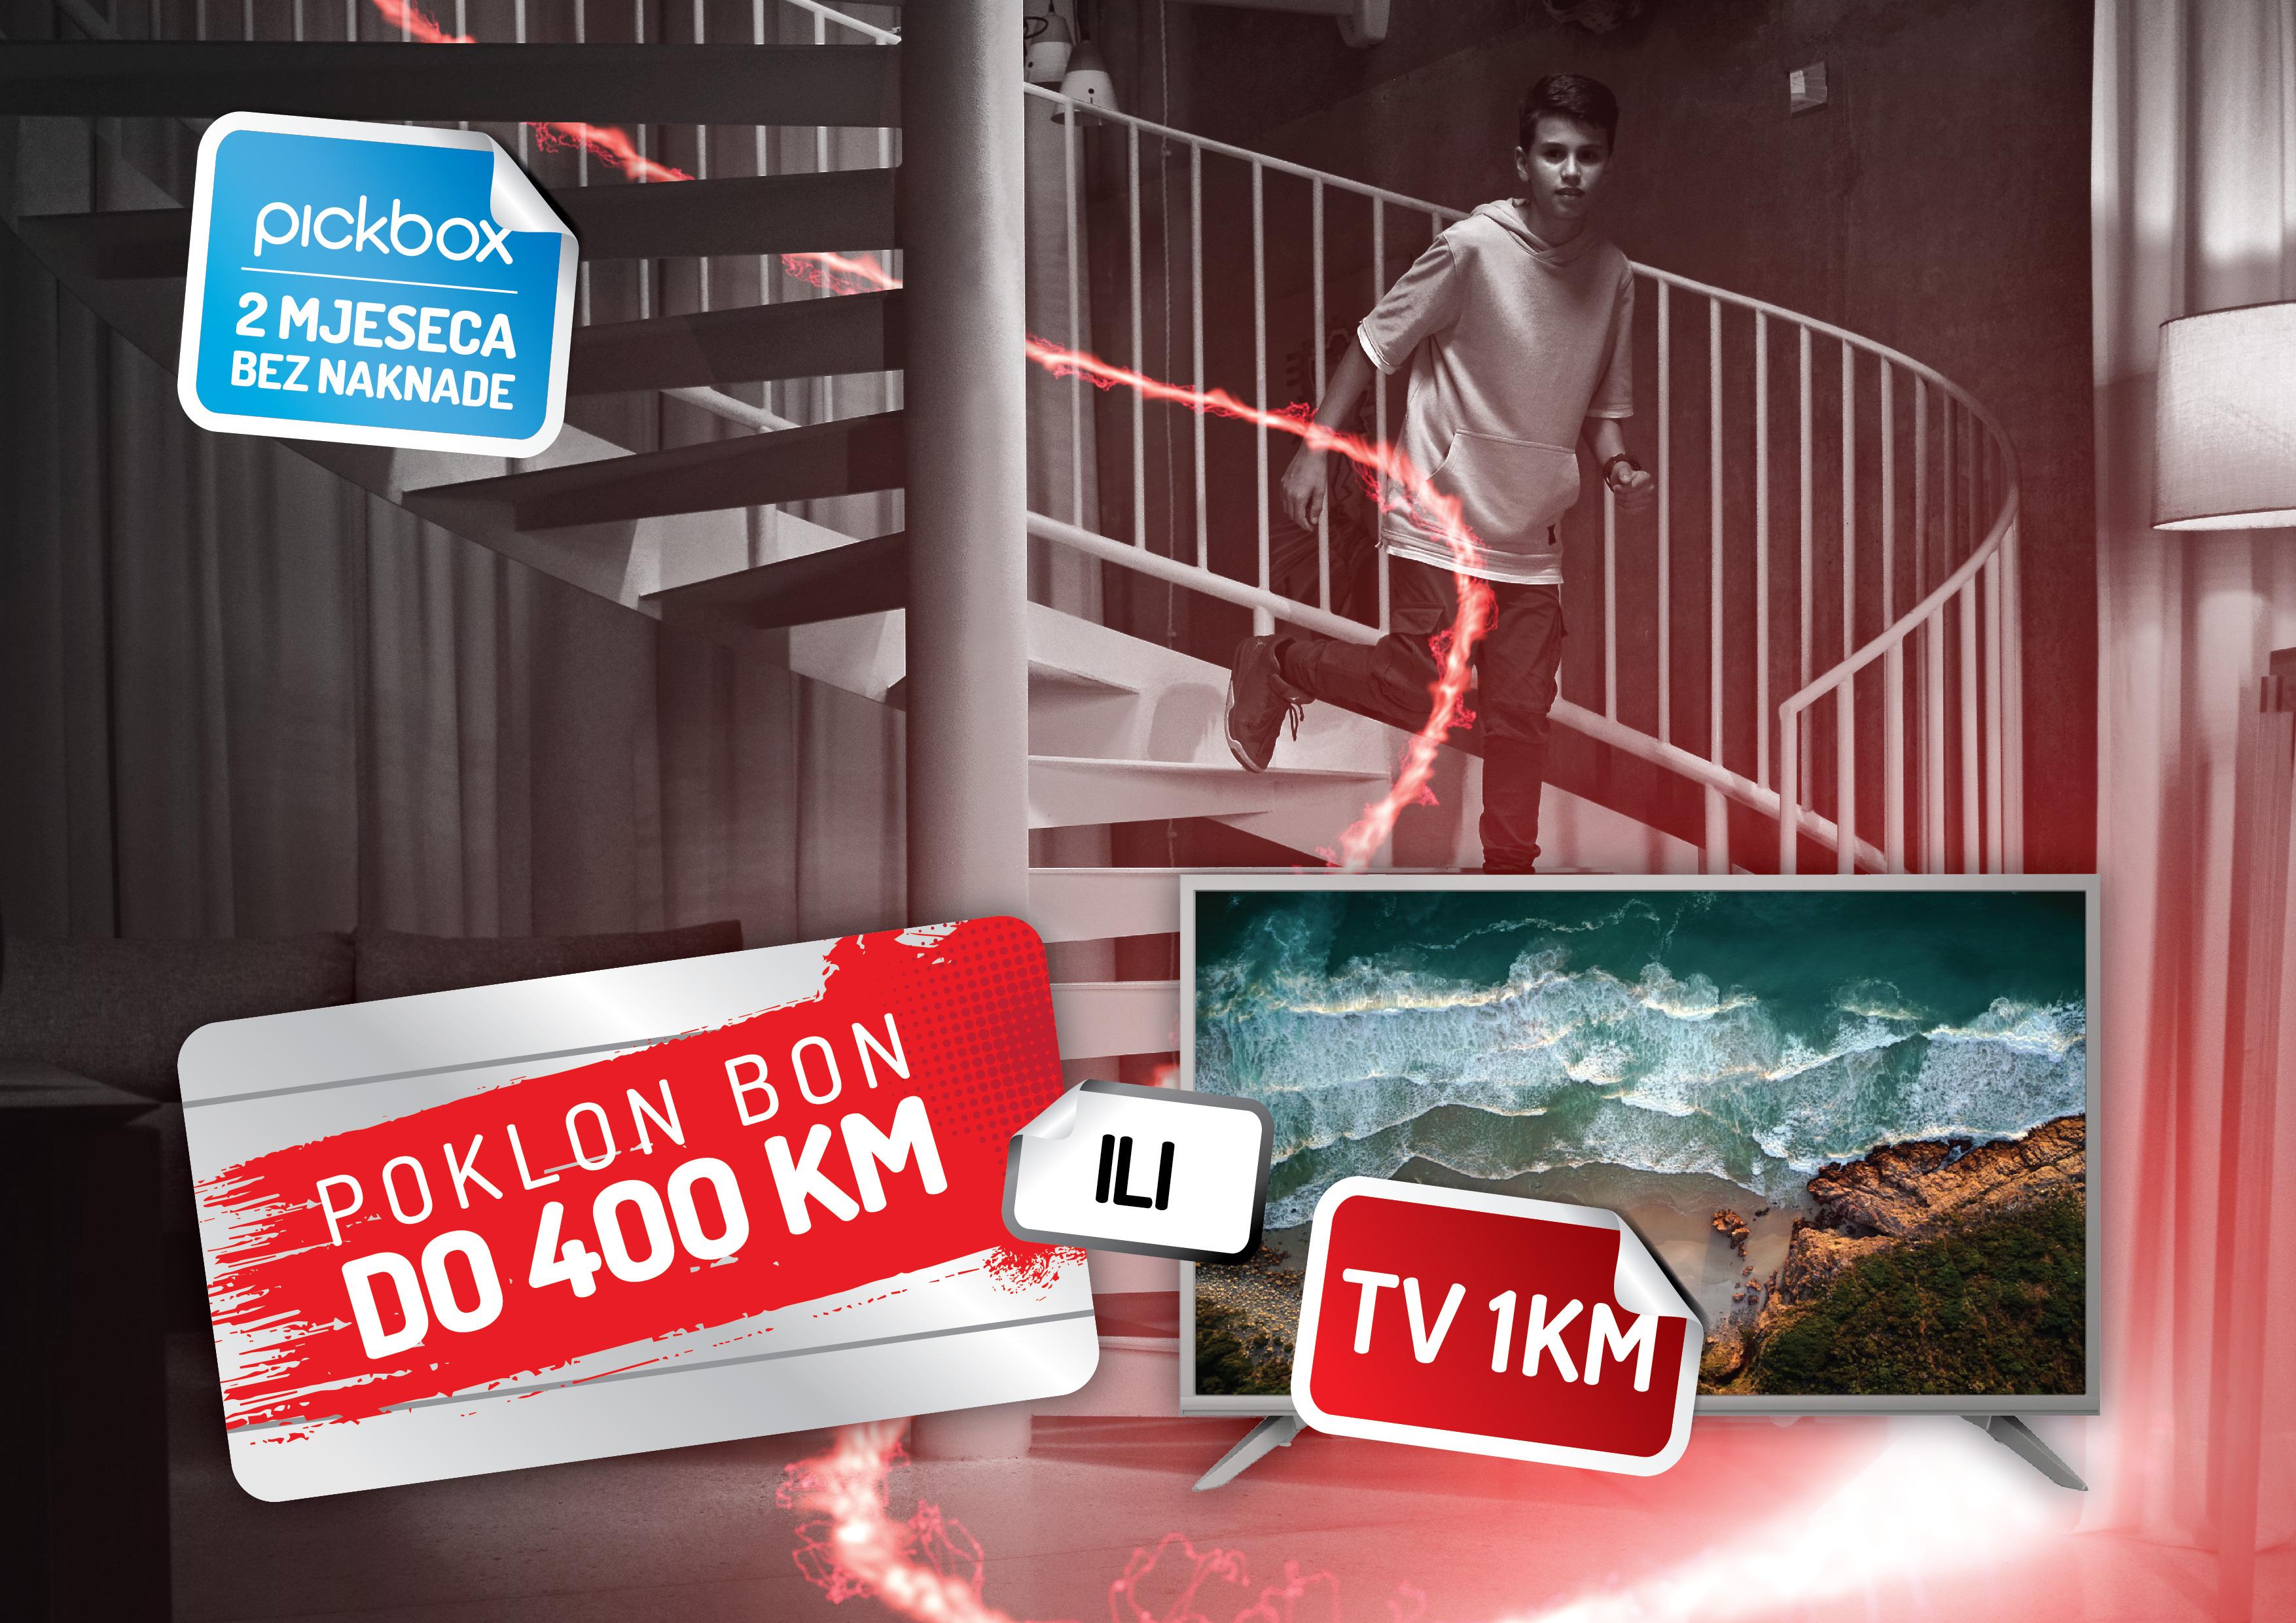 Nova ponuda uz m:tel TV Pakete – poklon bon ili TV uređaj